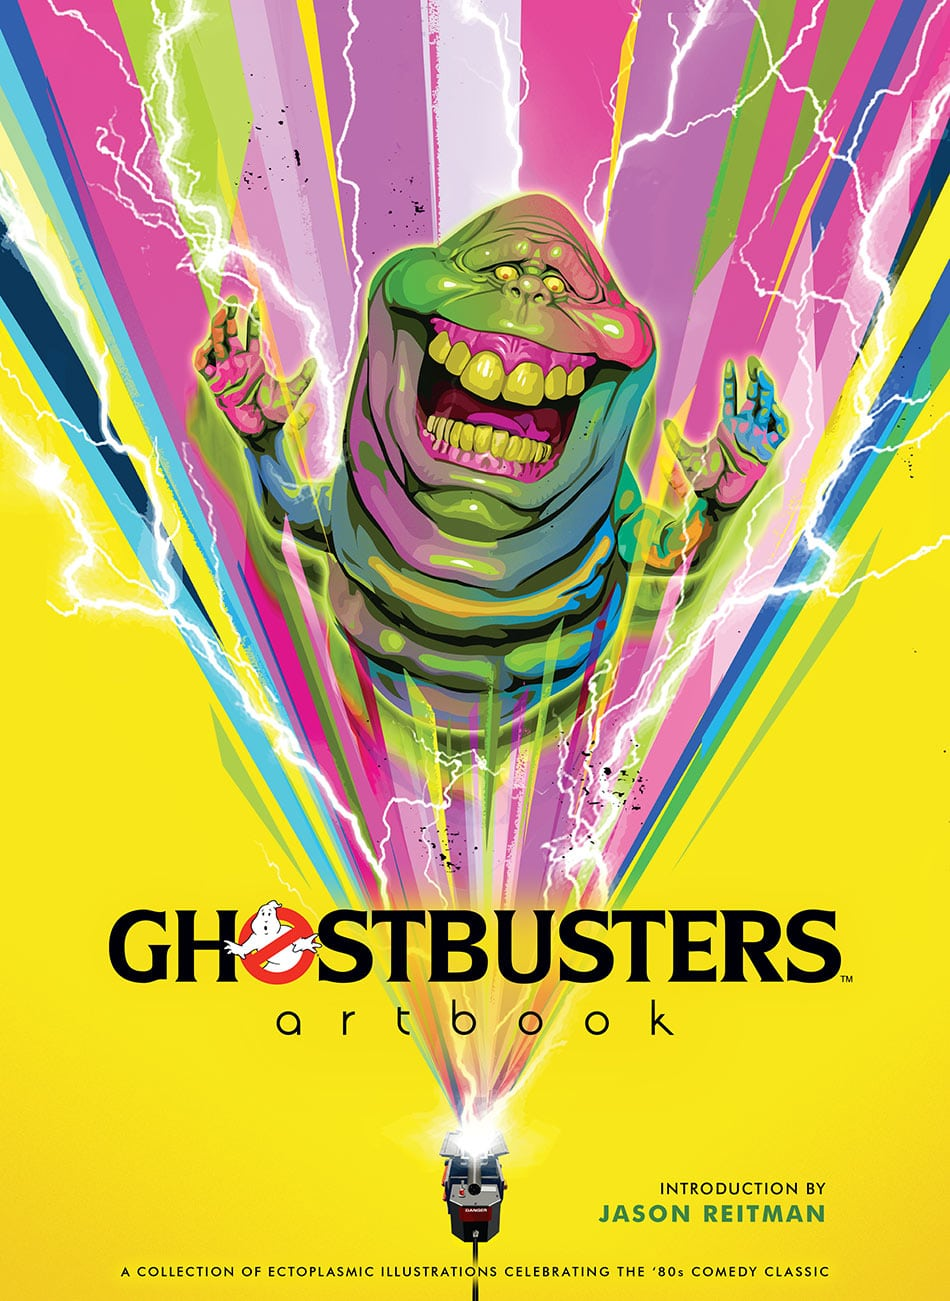 ghostbusters-artbook